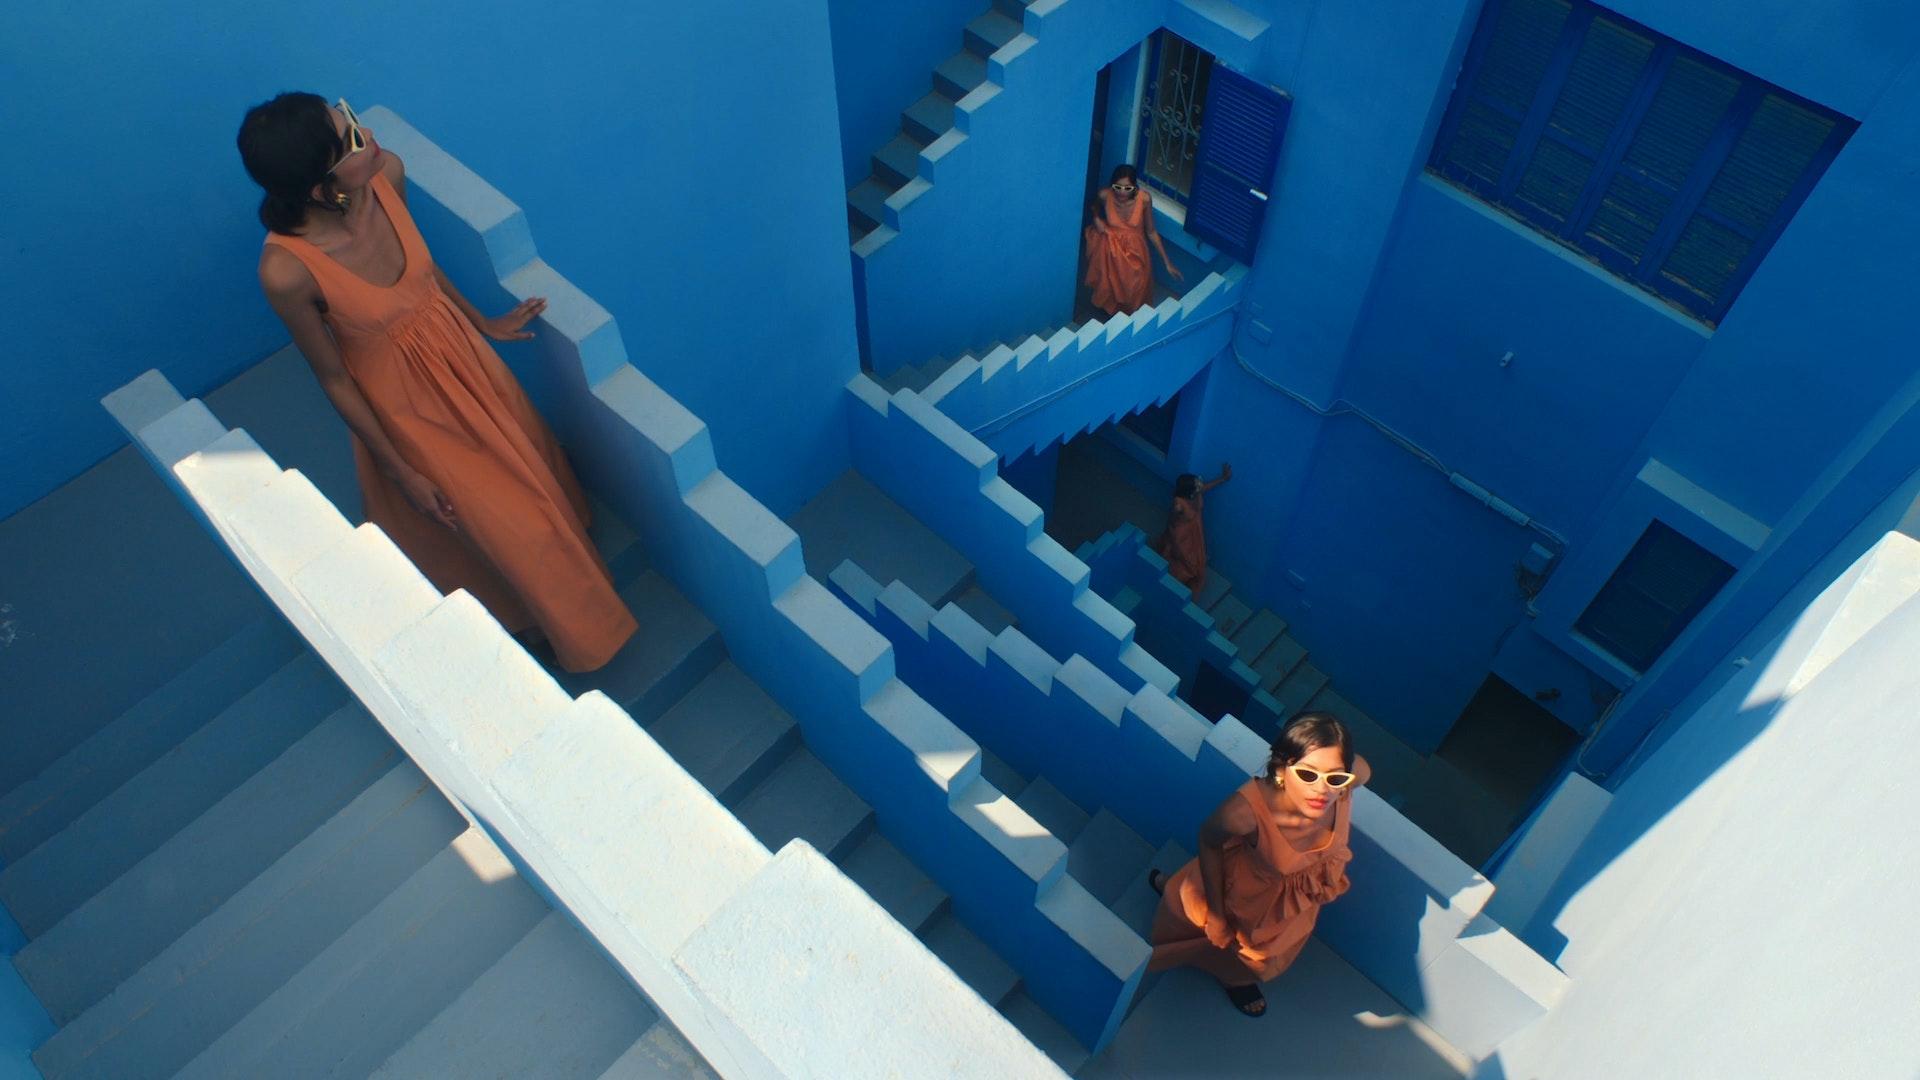 Joel Kazuo Knoernschild - Rothy's 'Slide'